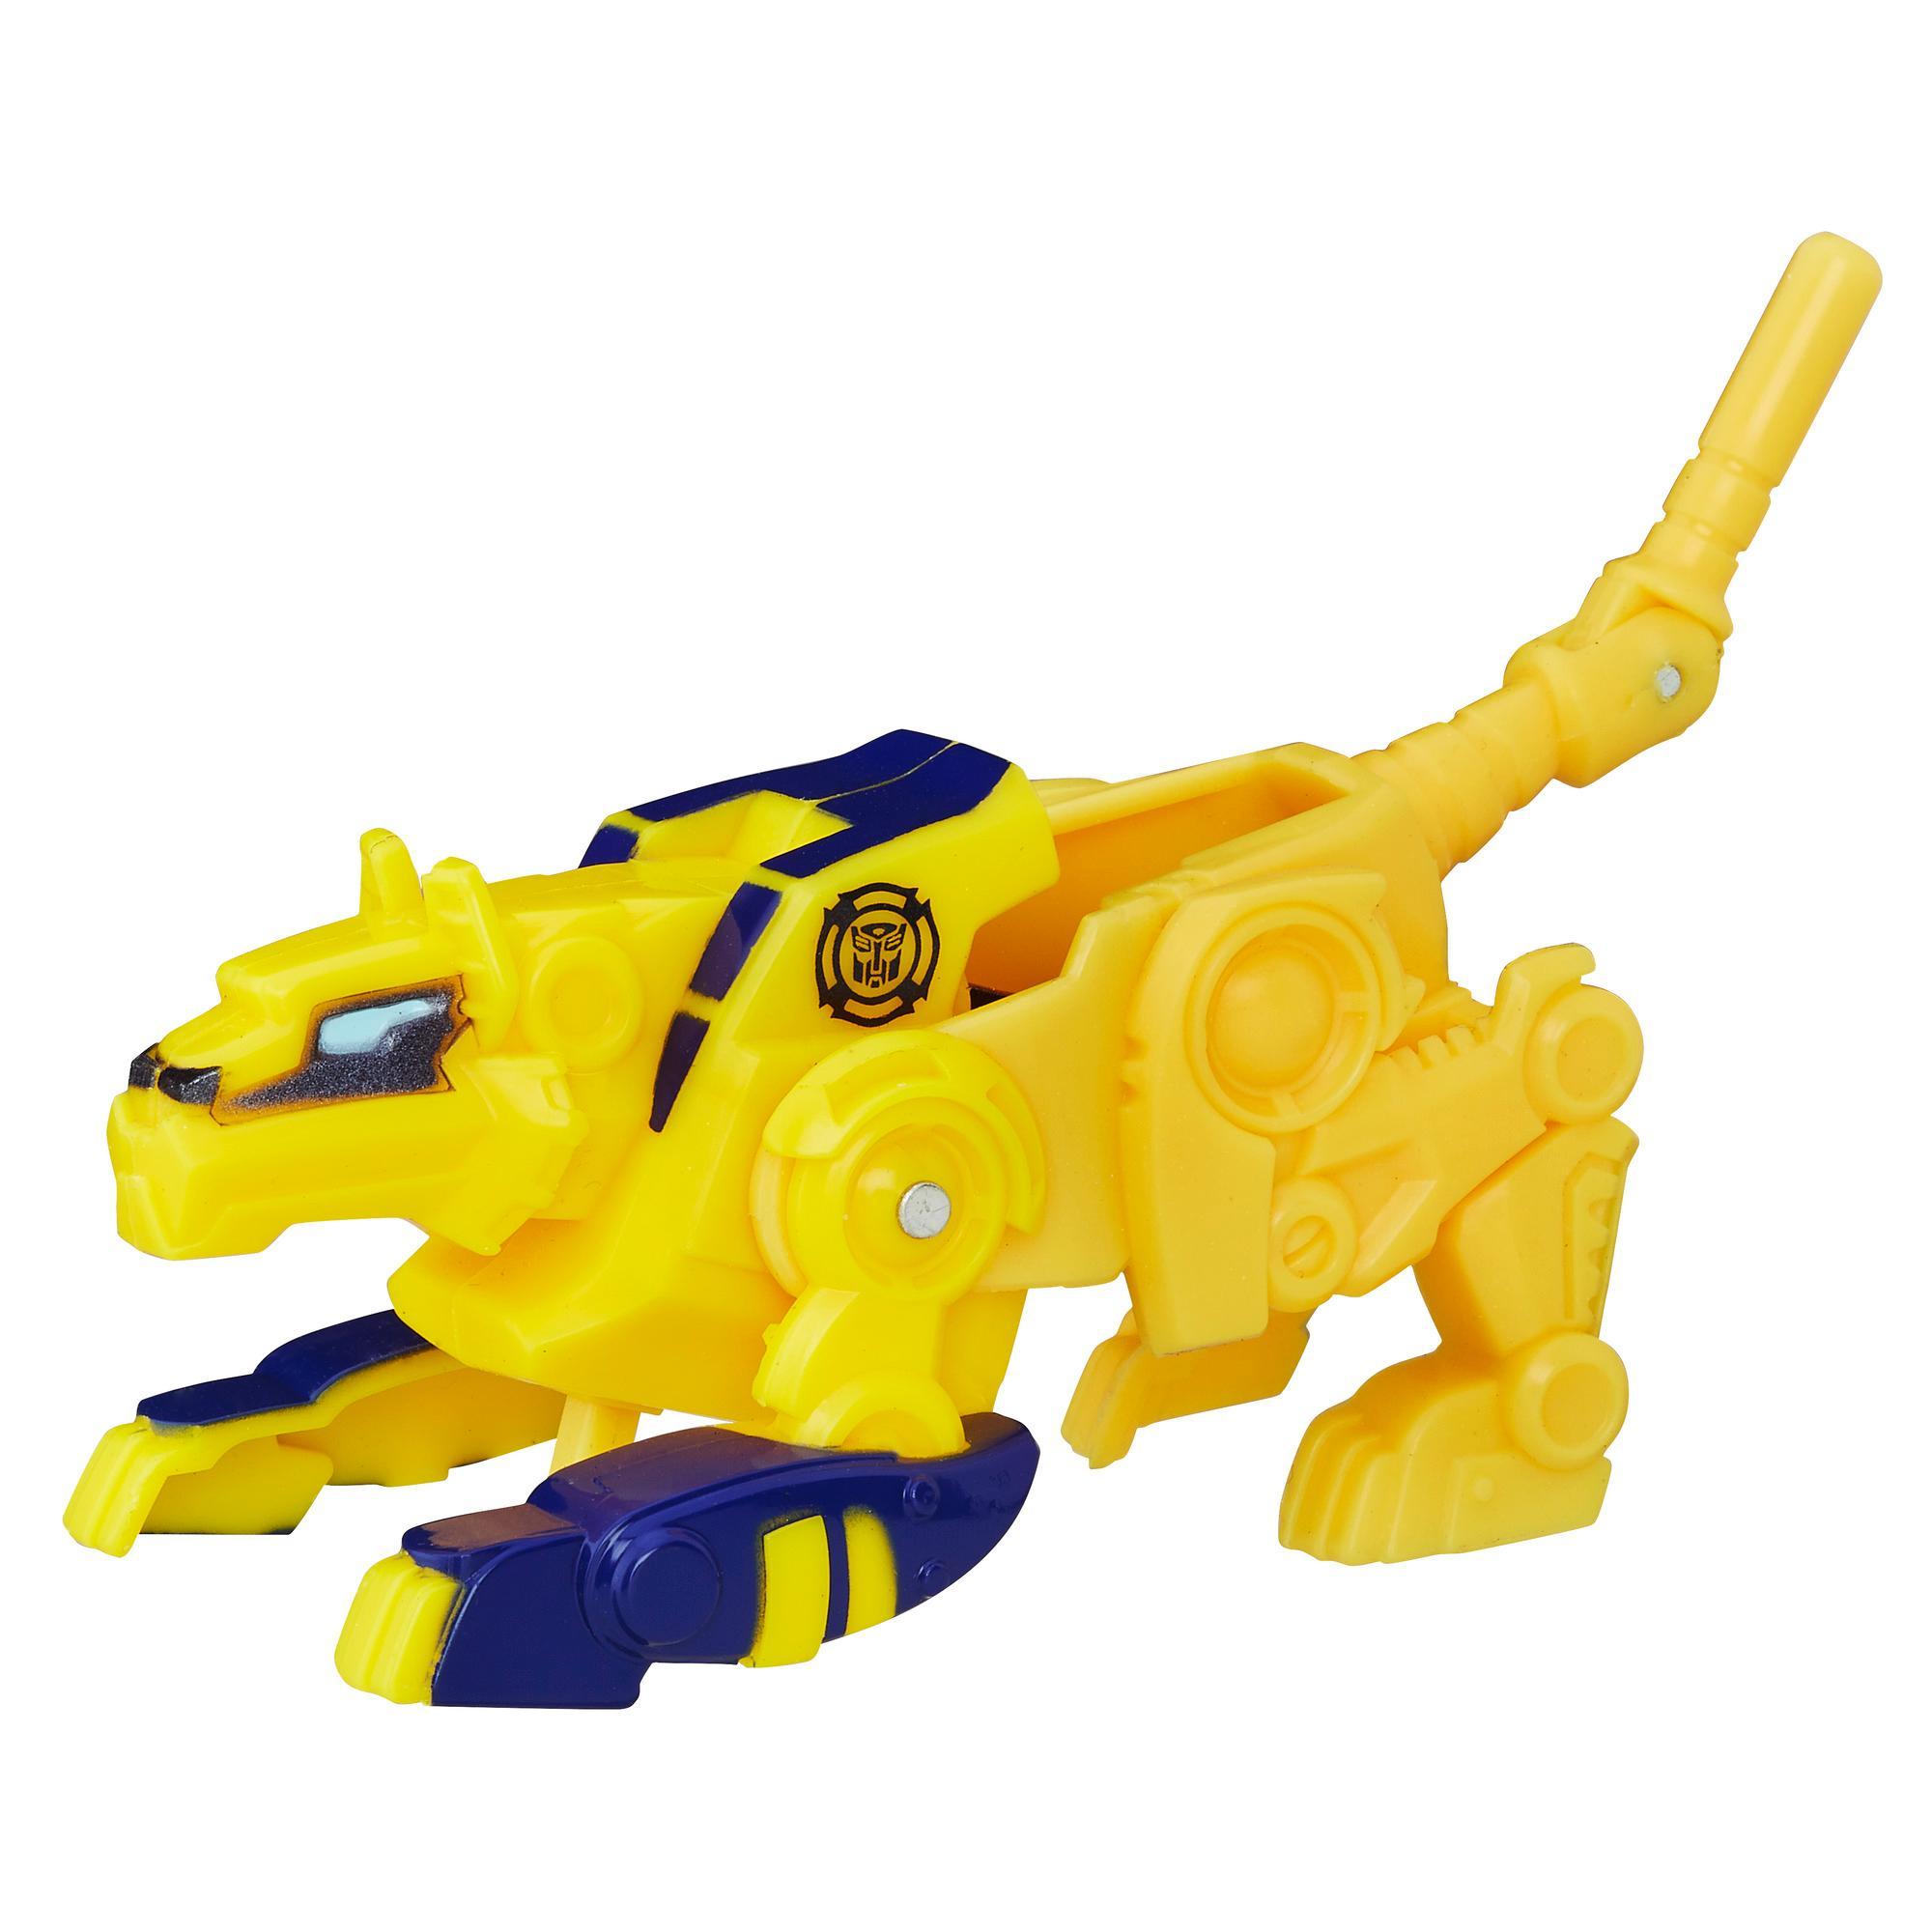 Playskool Heroes Transformers Rescue Bots Swift the Cheetah-Bot